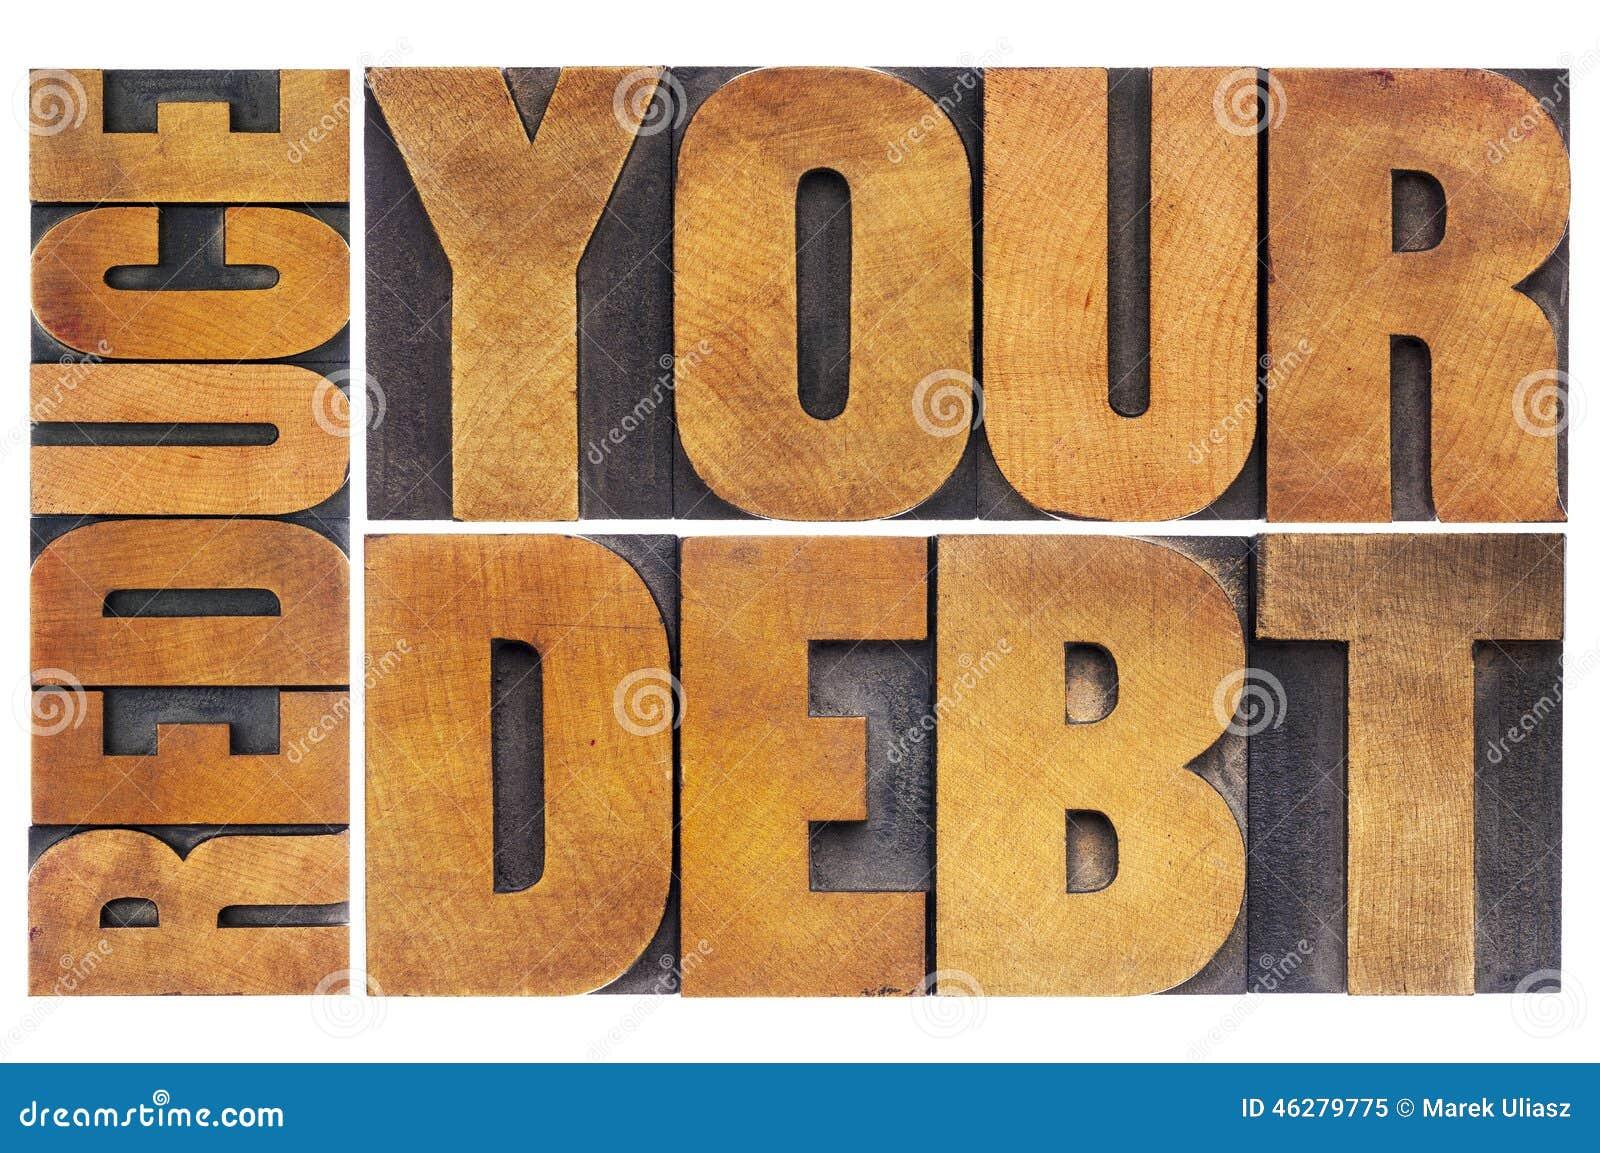 reduce your debt stock photo